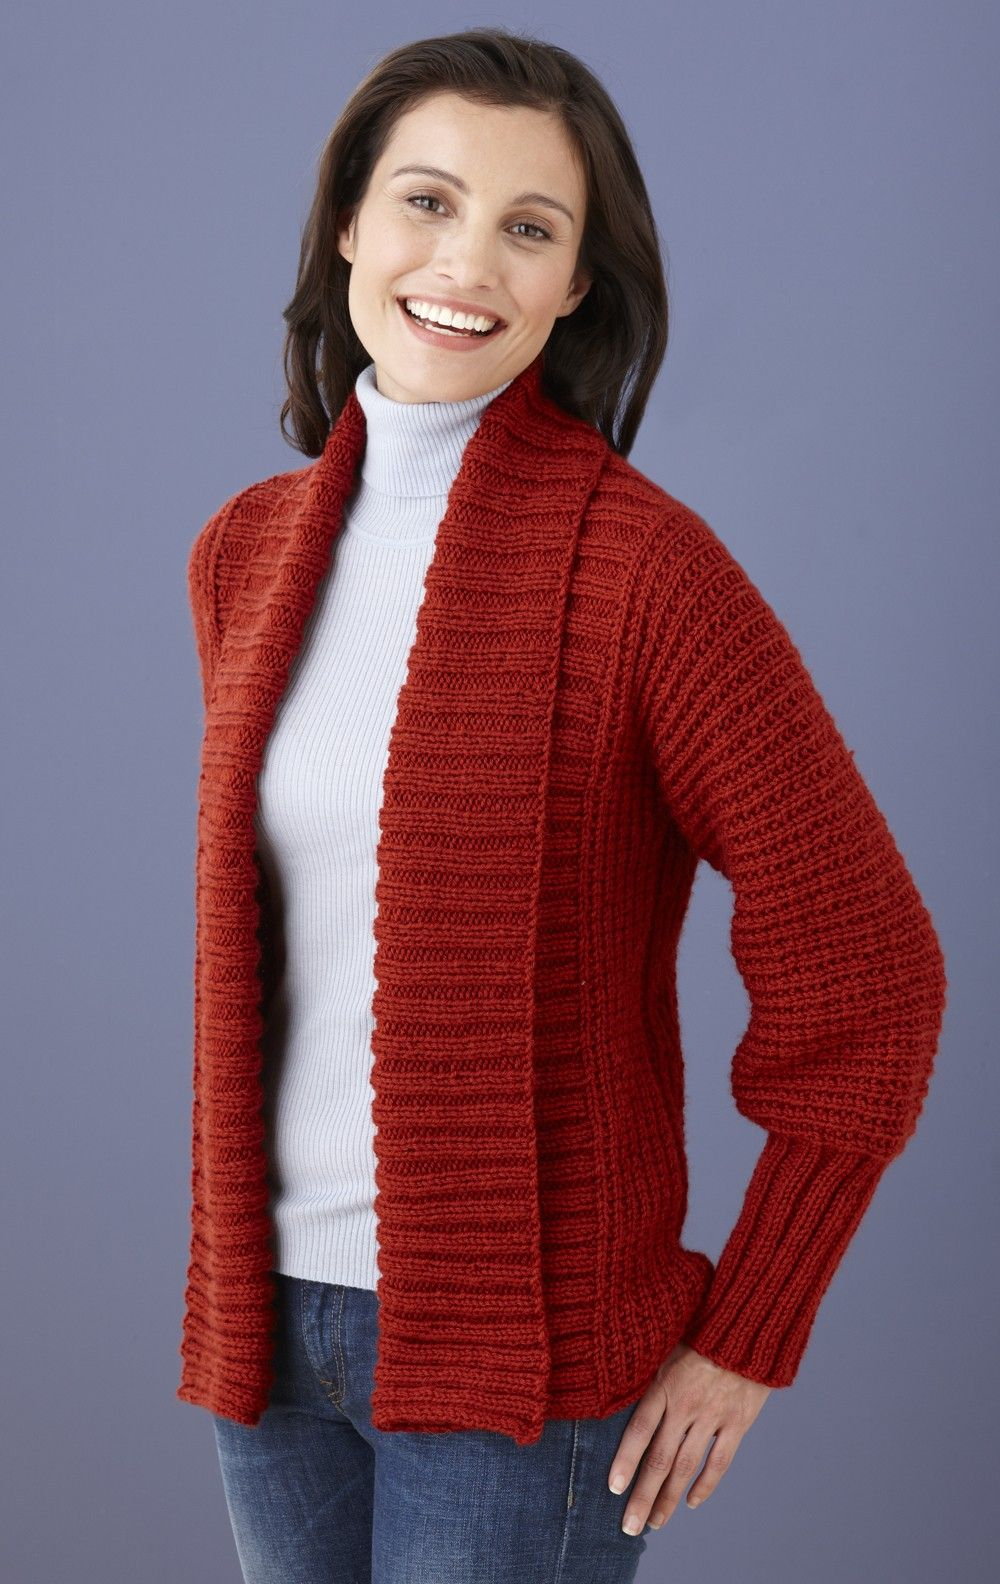 Drapey Cardigan (Knit) - Lion Brand Yarn | بافت۱ | Pinterest | Lions ...